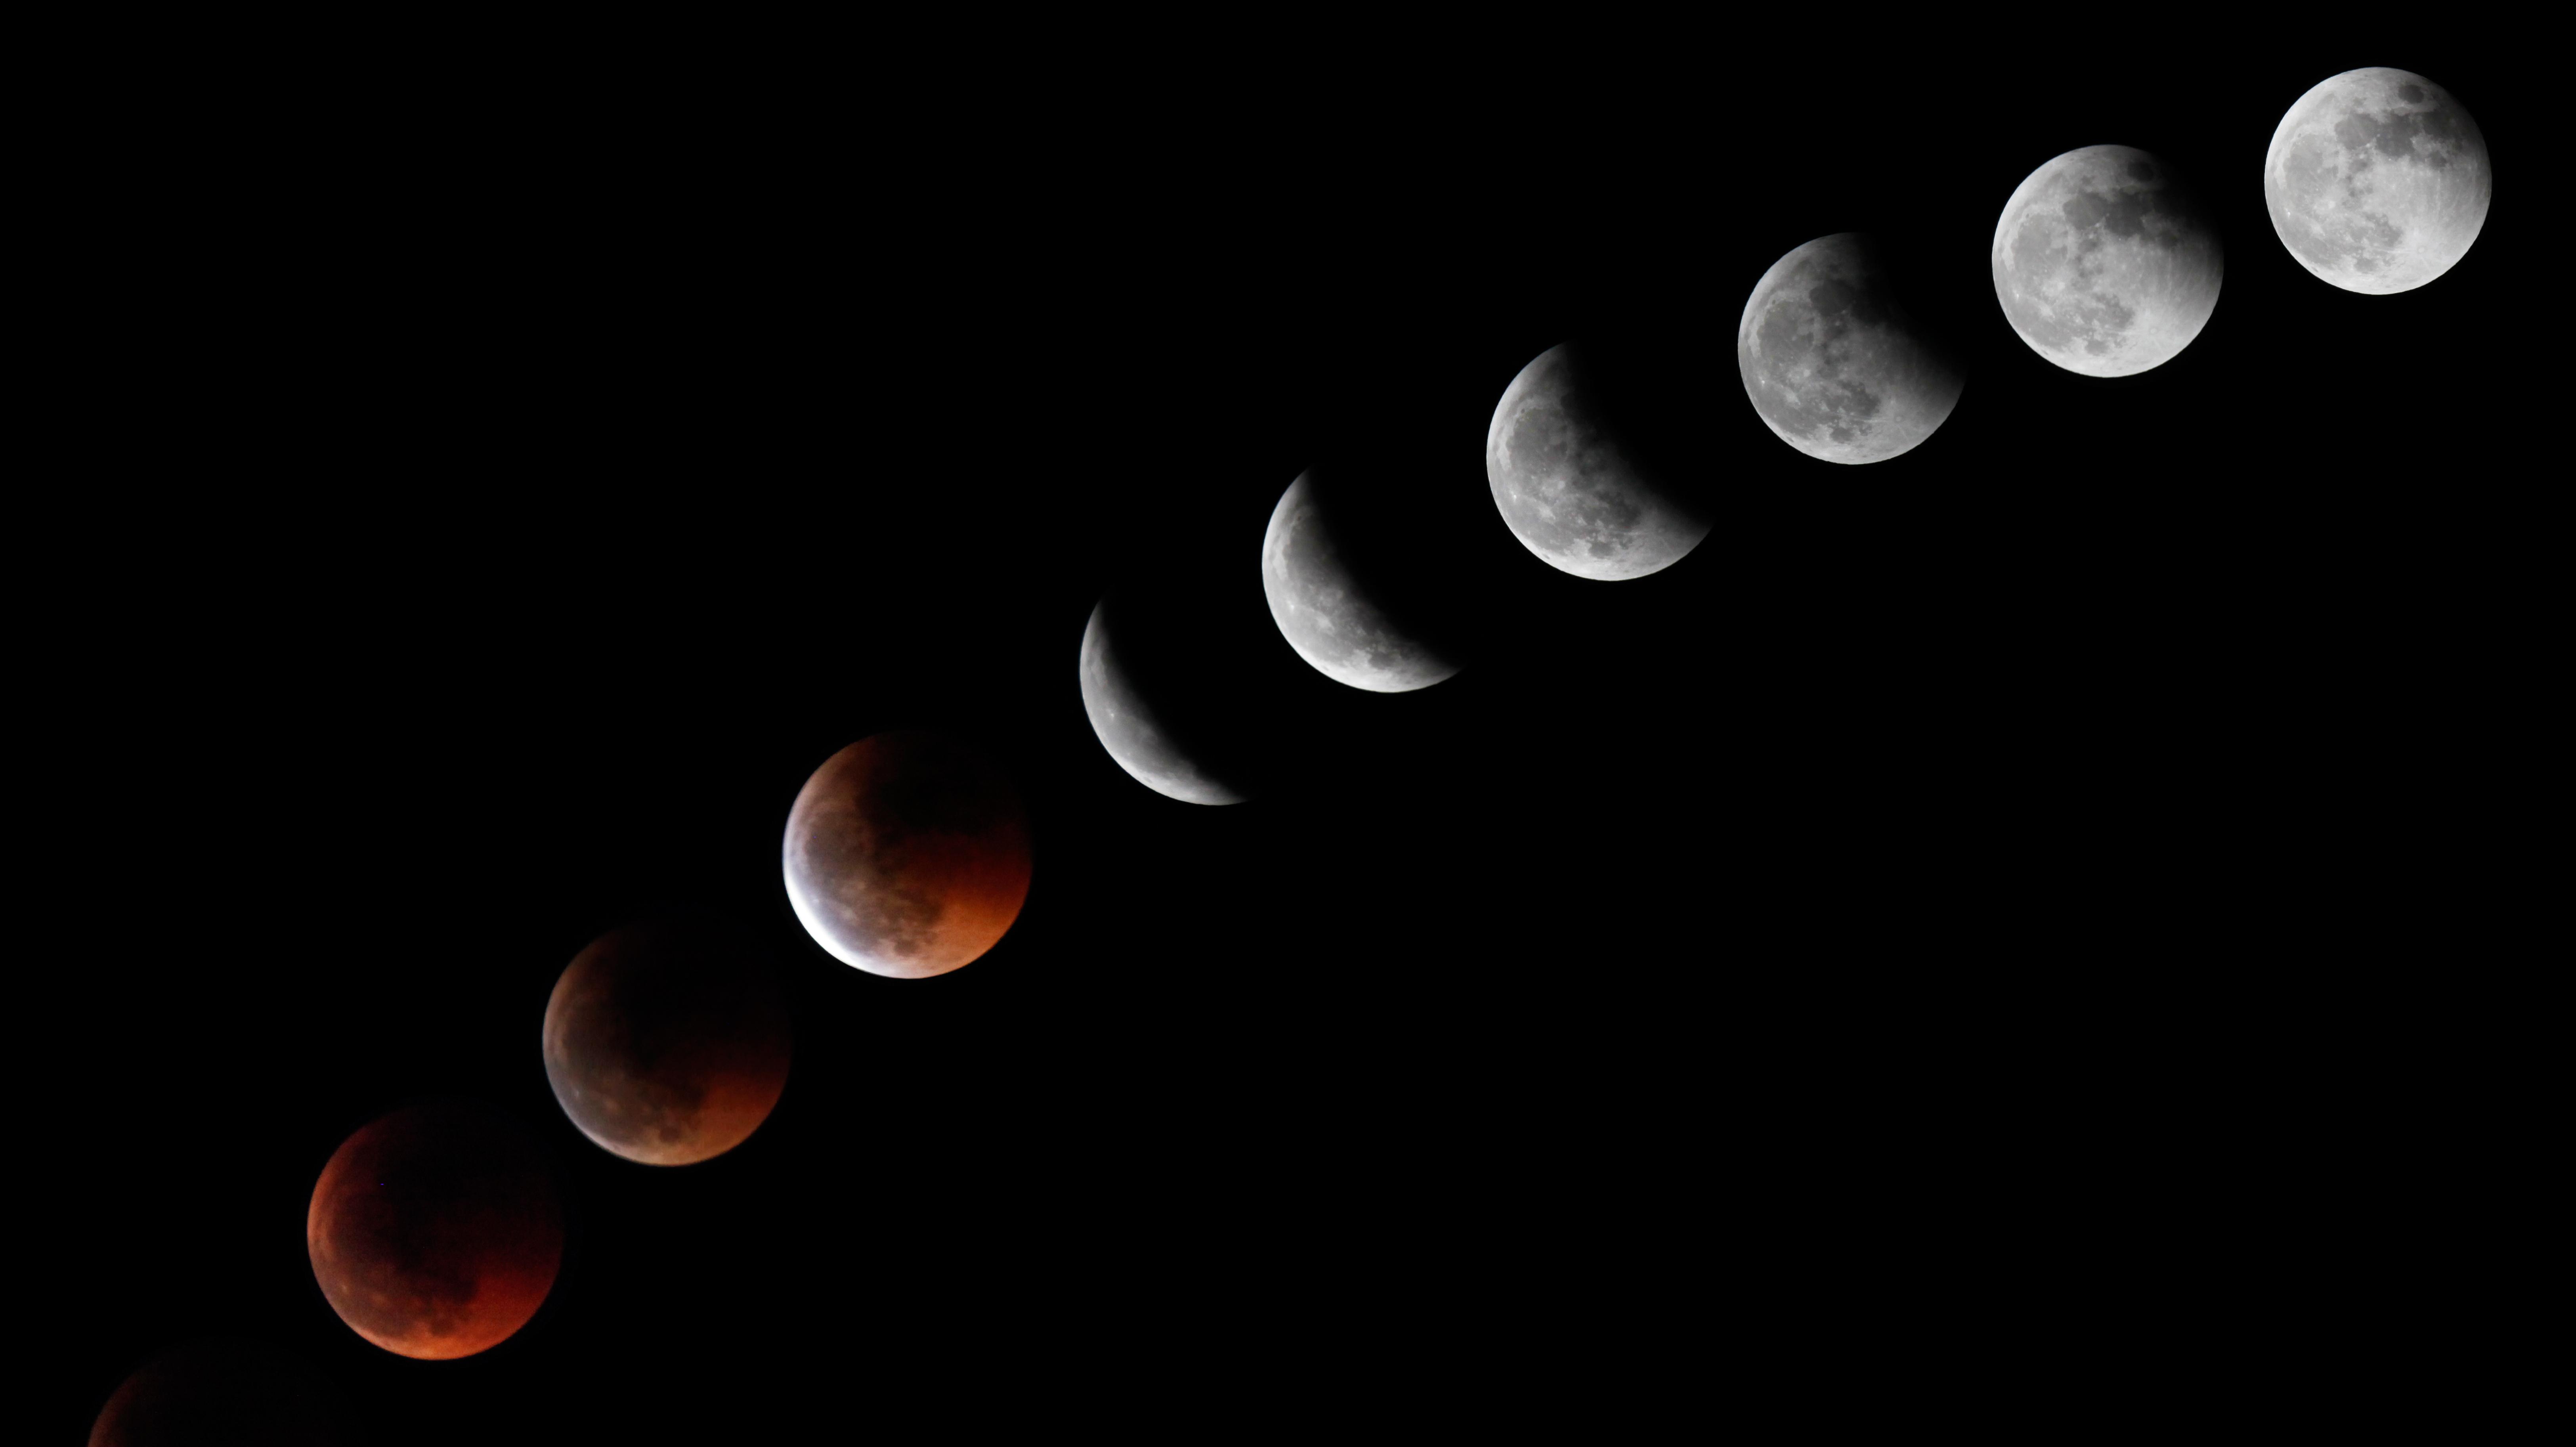 blood moon eclipse west coast - photo #21